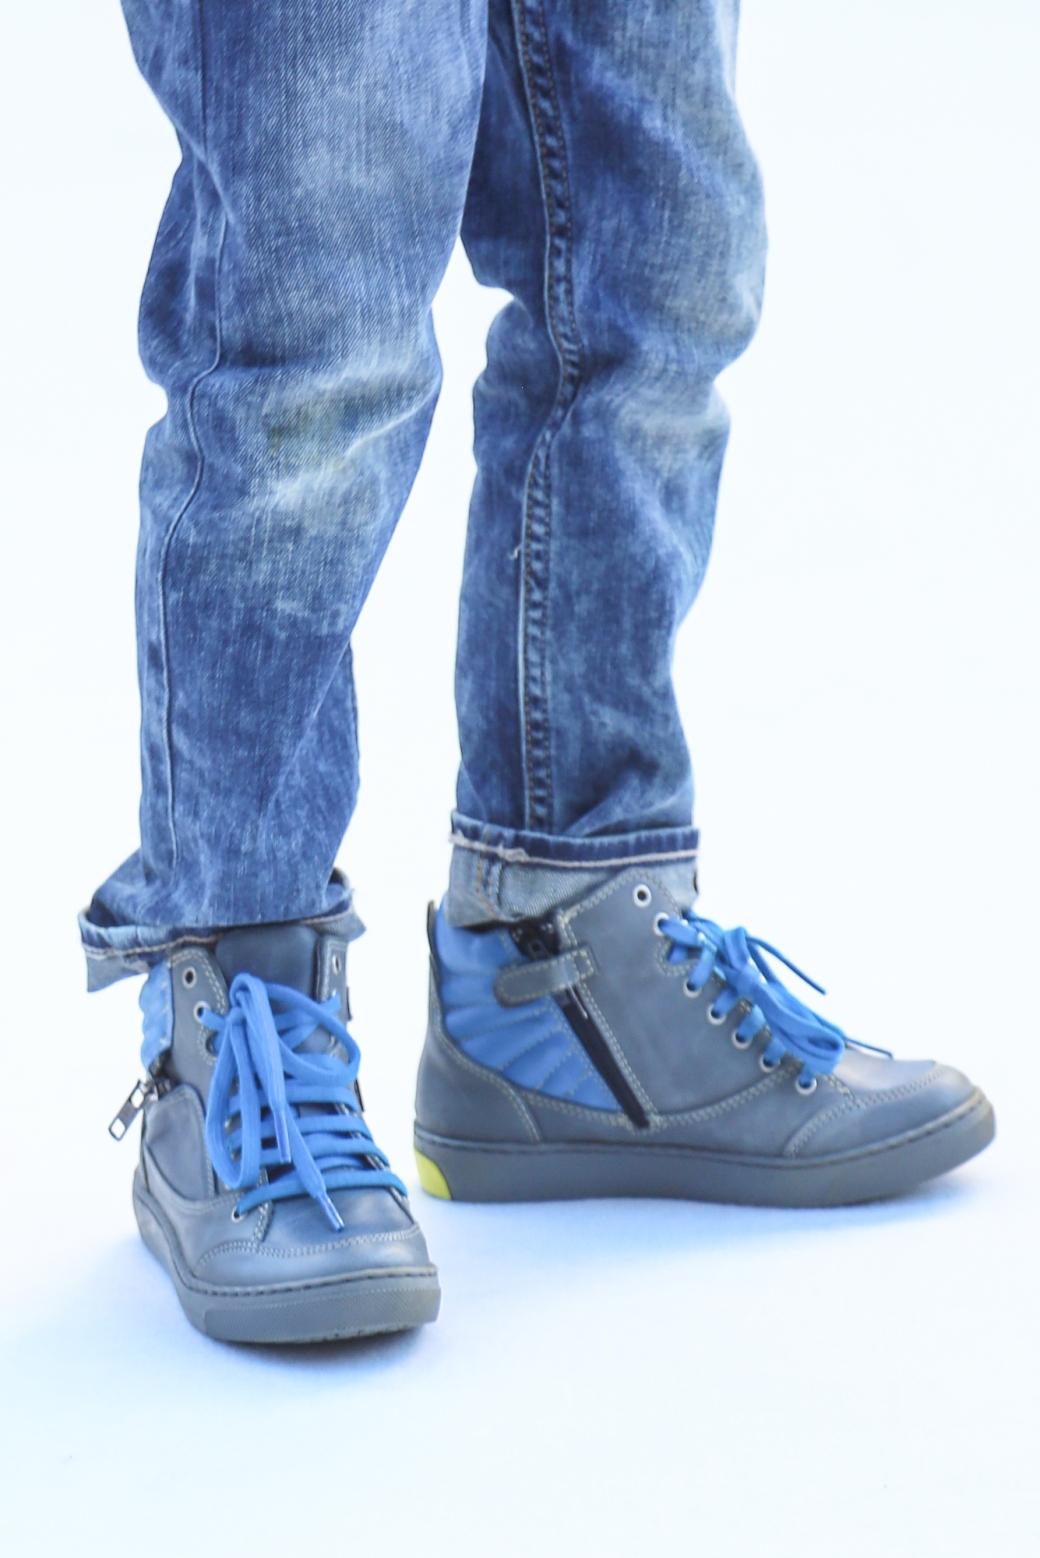 petit-style-walking-bcn-127